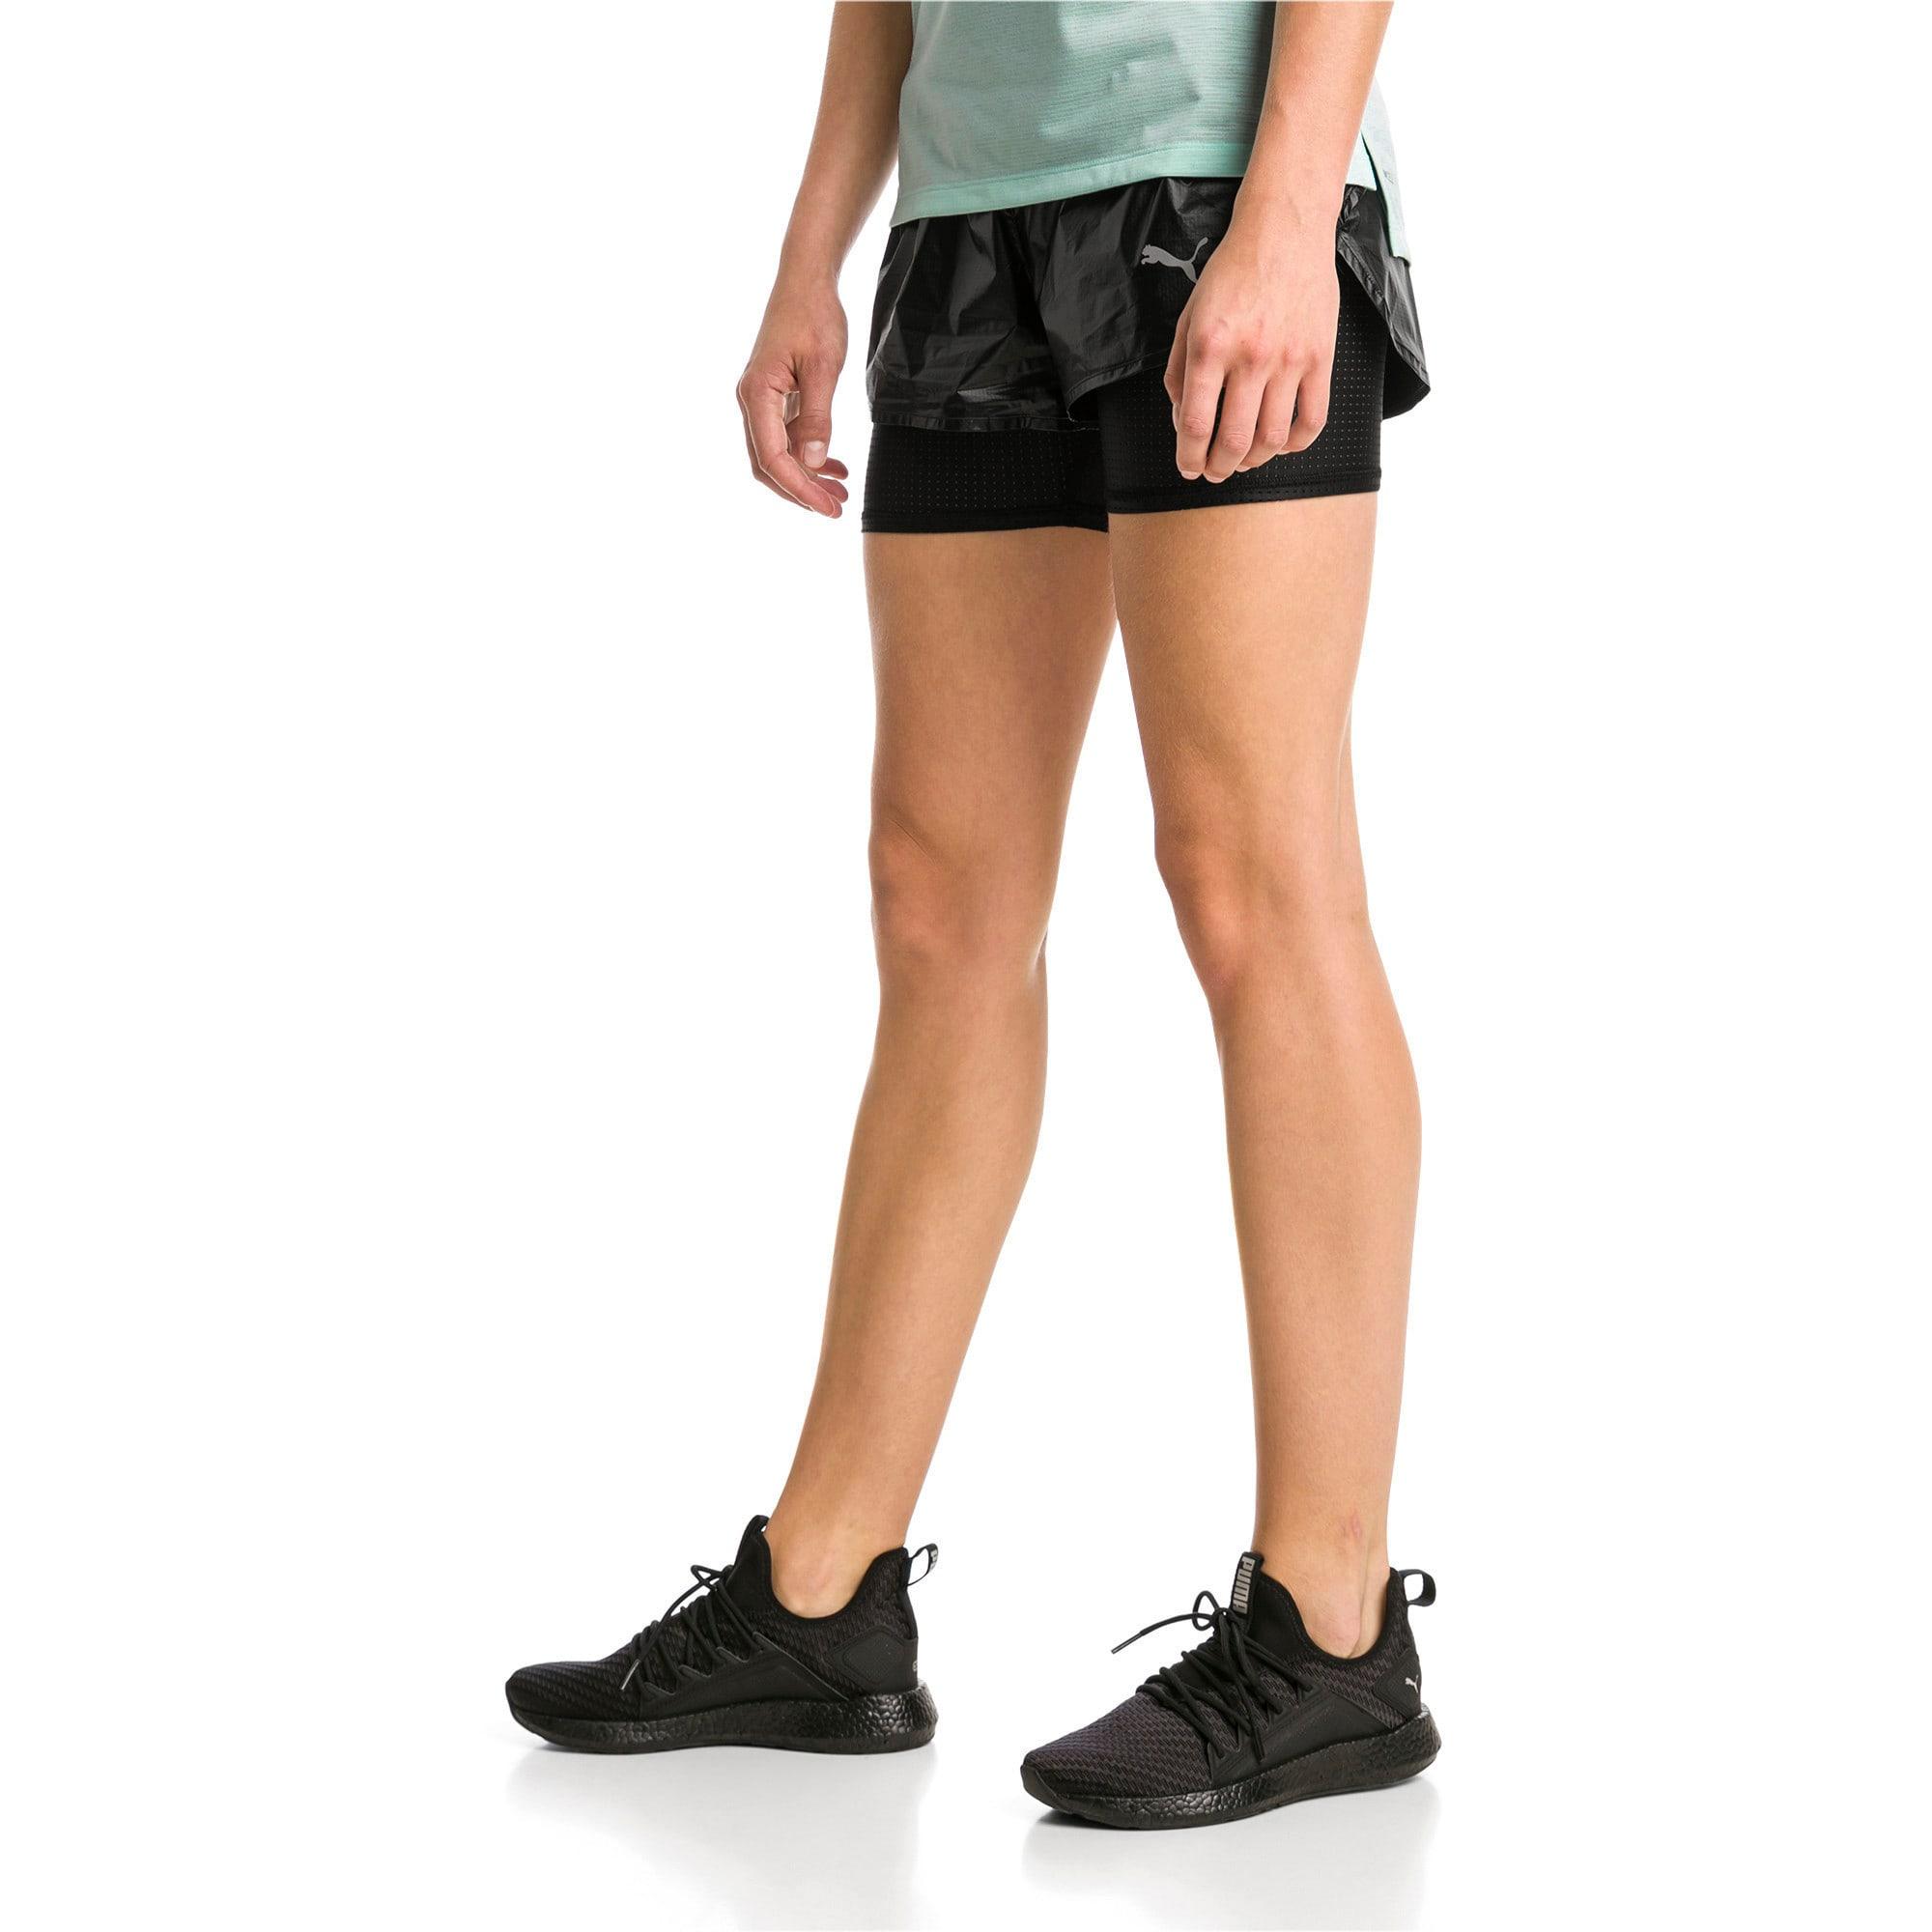 Thumbnail 2 of Blast Woven 2 in 1 Women's Running Shorts, Puma Black-metallic, medium-IND